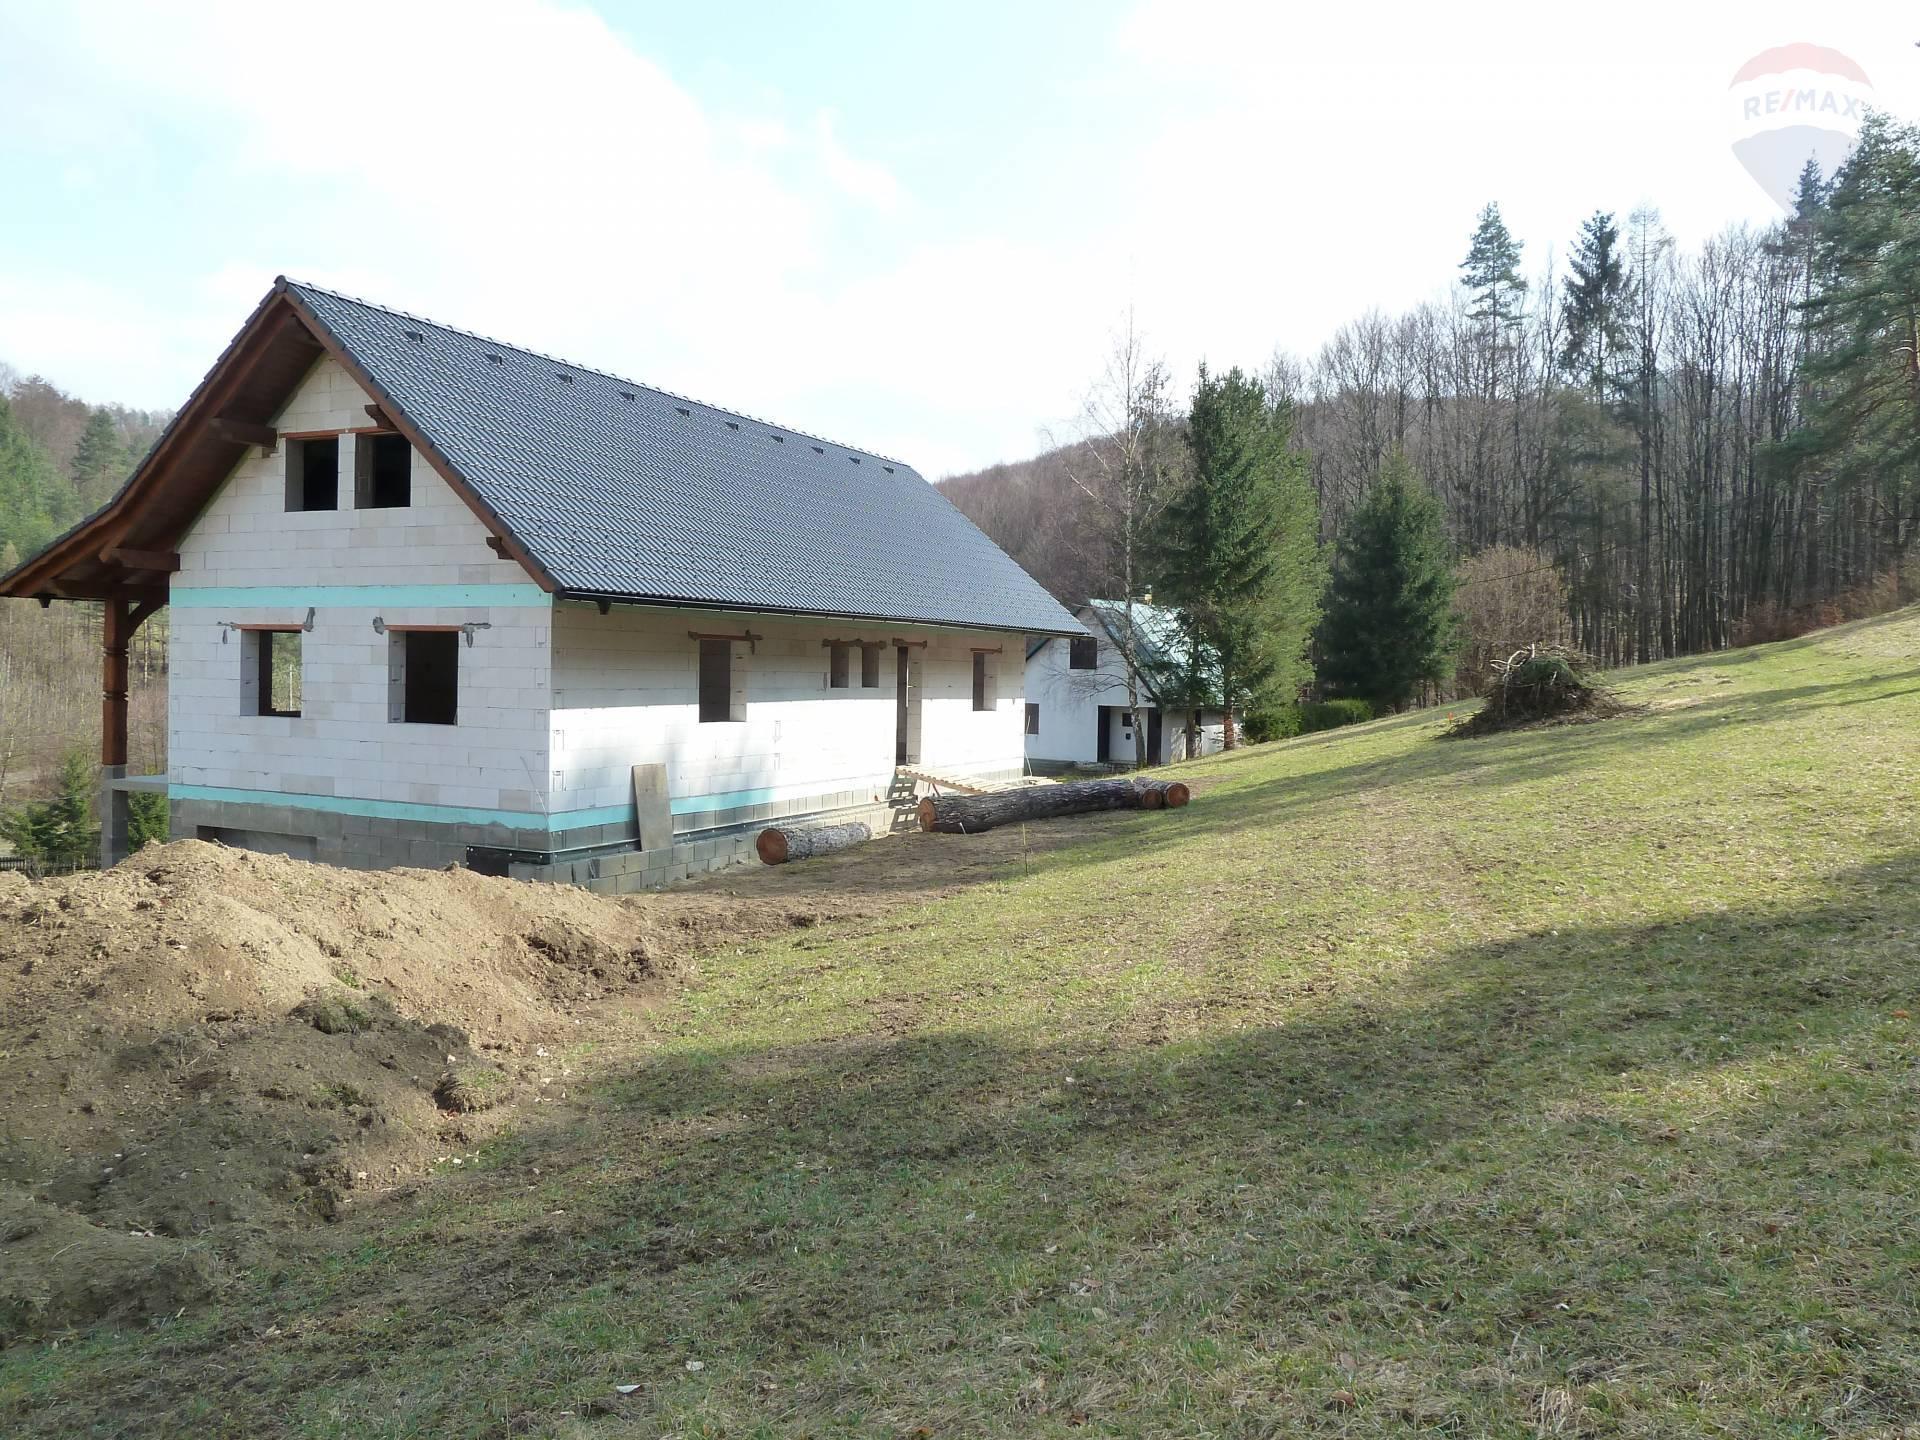 REZERVOVANÉ - Predaj domu Ilava - Iliavčanska dolina